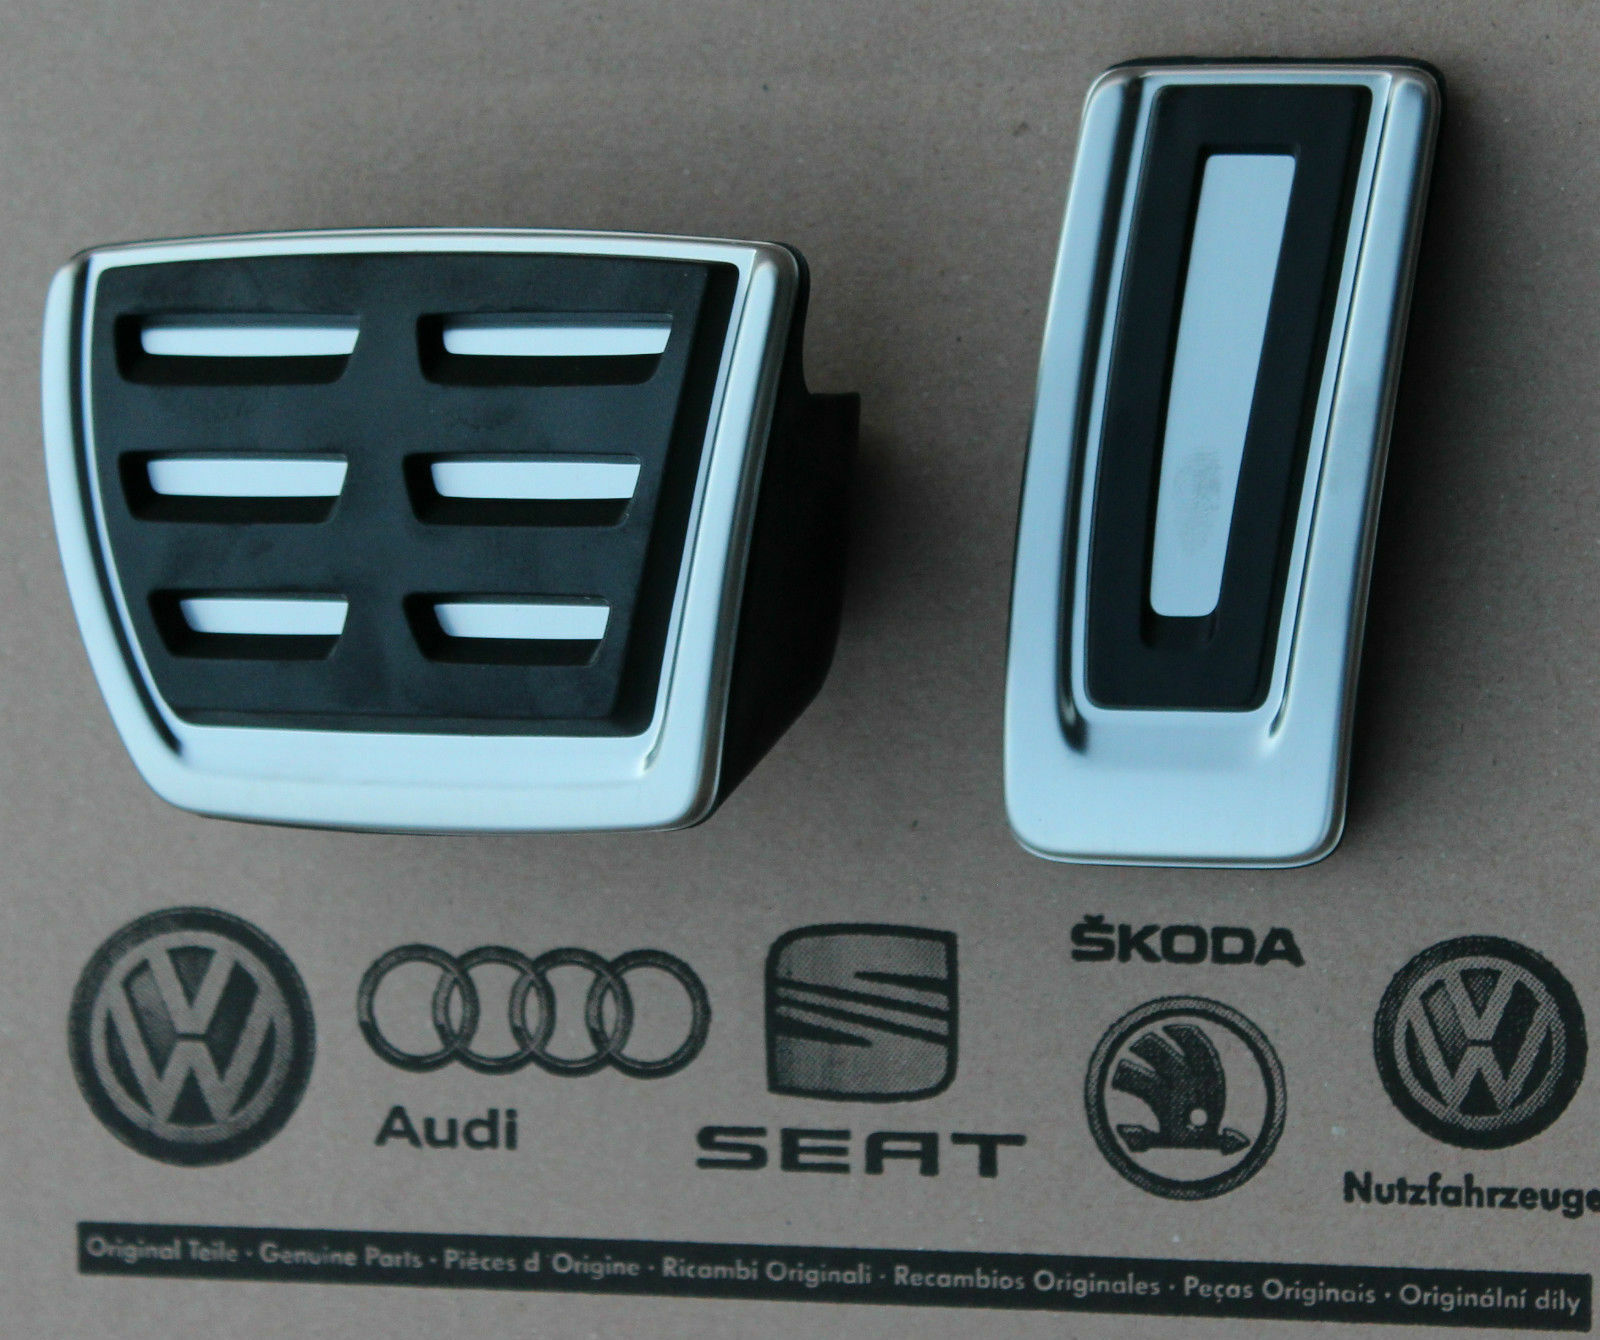 Gr/ö/ße : at QUXING Pedalauflagen Pedal Edelstahl-Auto-Pedal-Kit F/ür VW F/ür Multivan T5 T6 F/ür Caravelle T6 Gasbremspedal-Schutzabdeckung Brems Pedalkappen